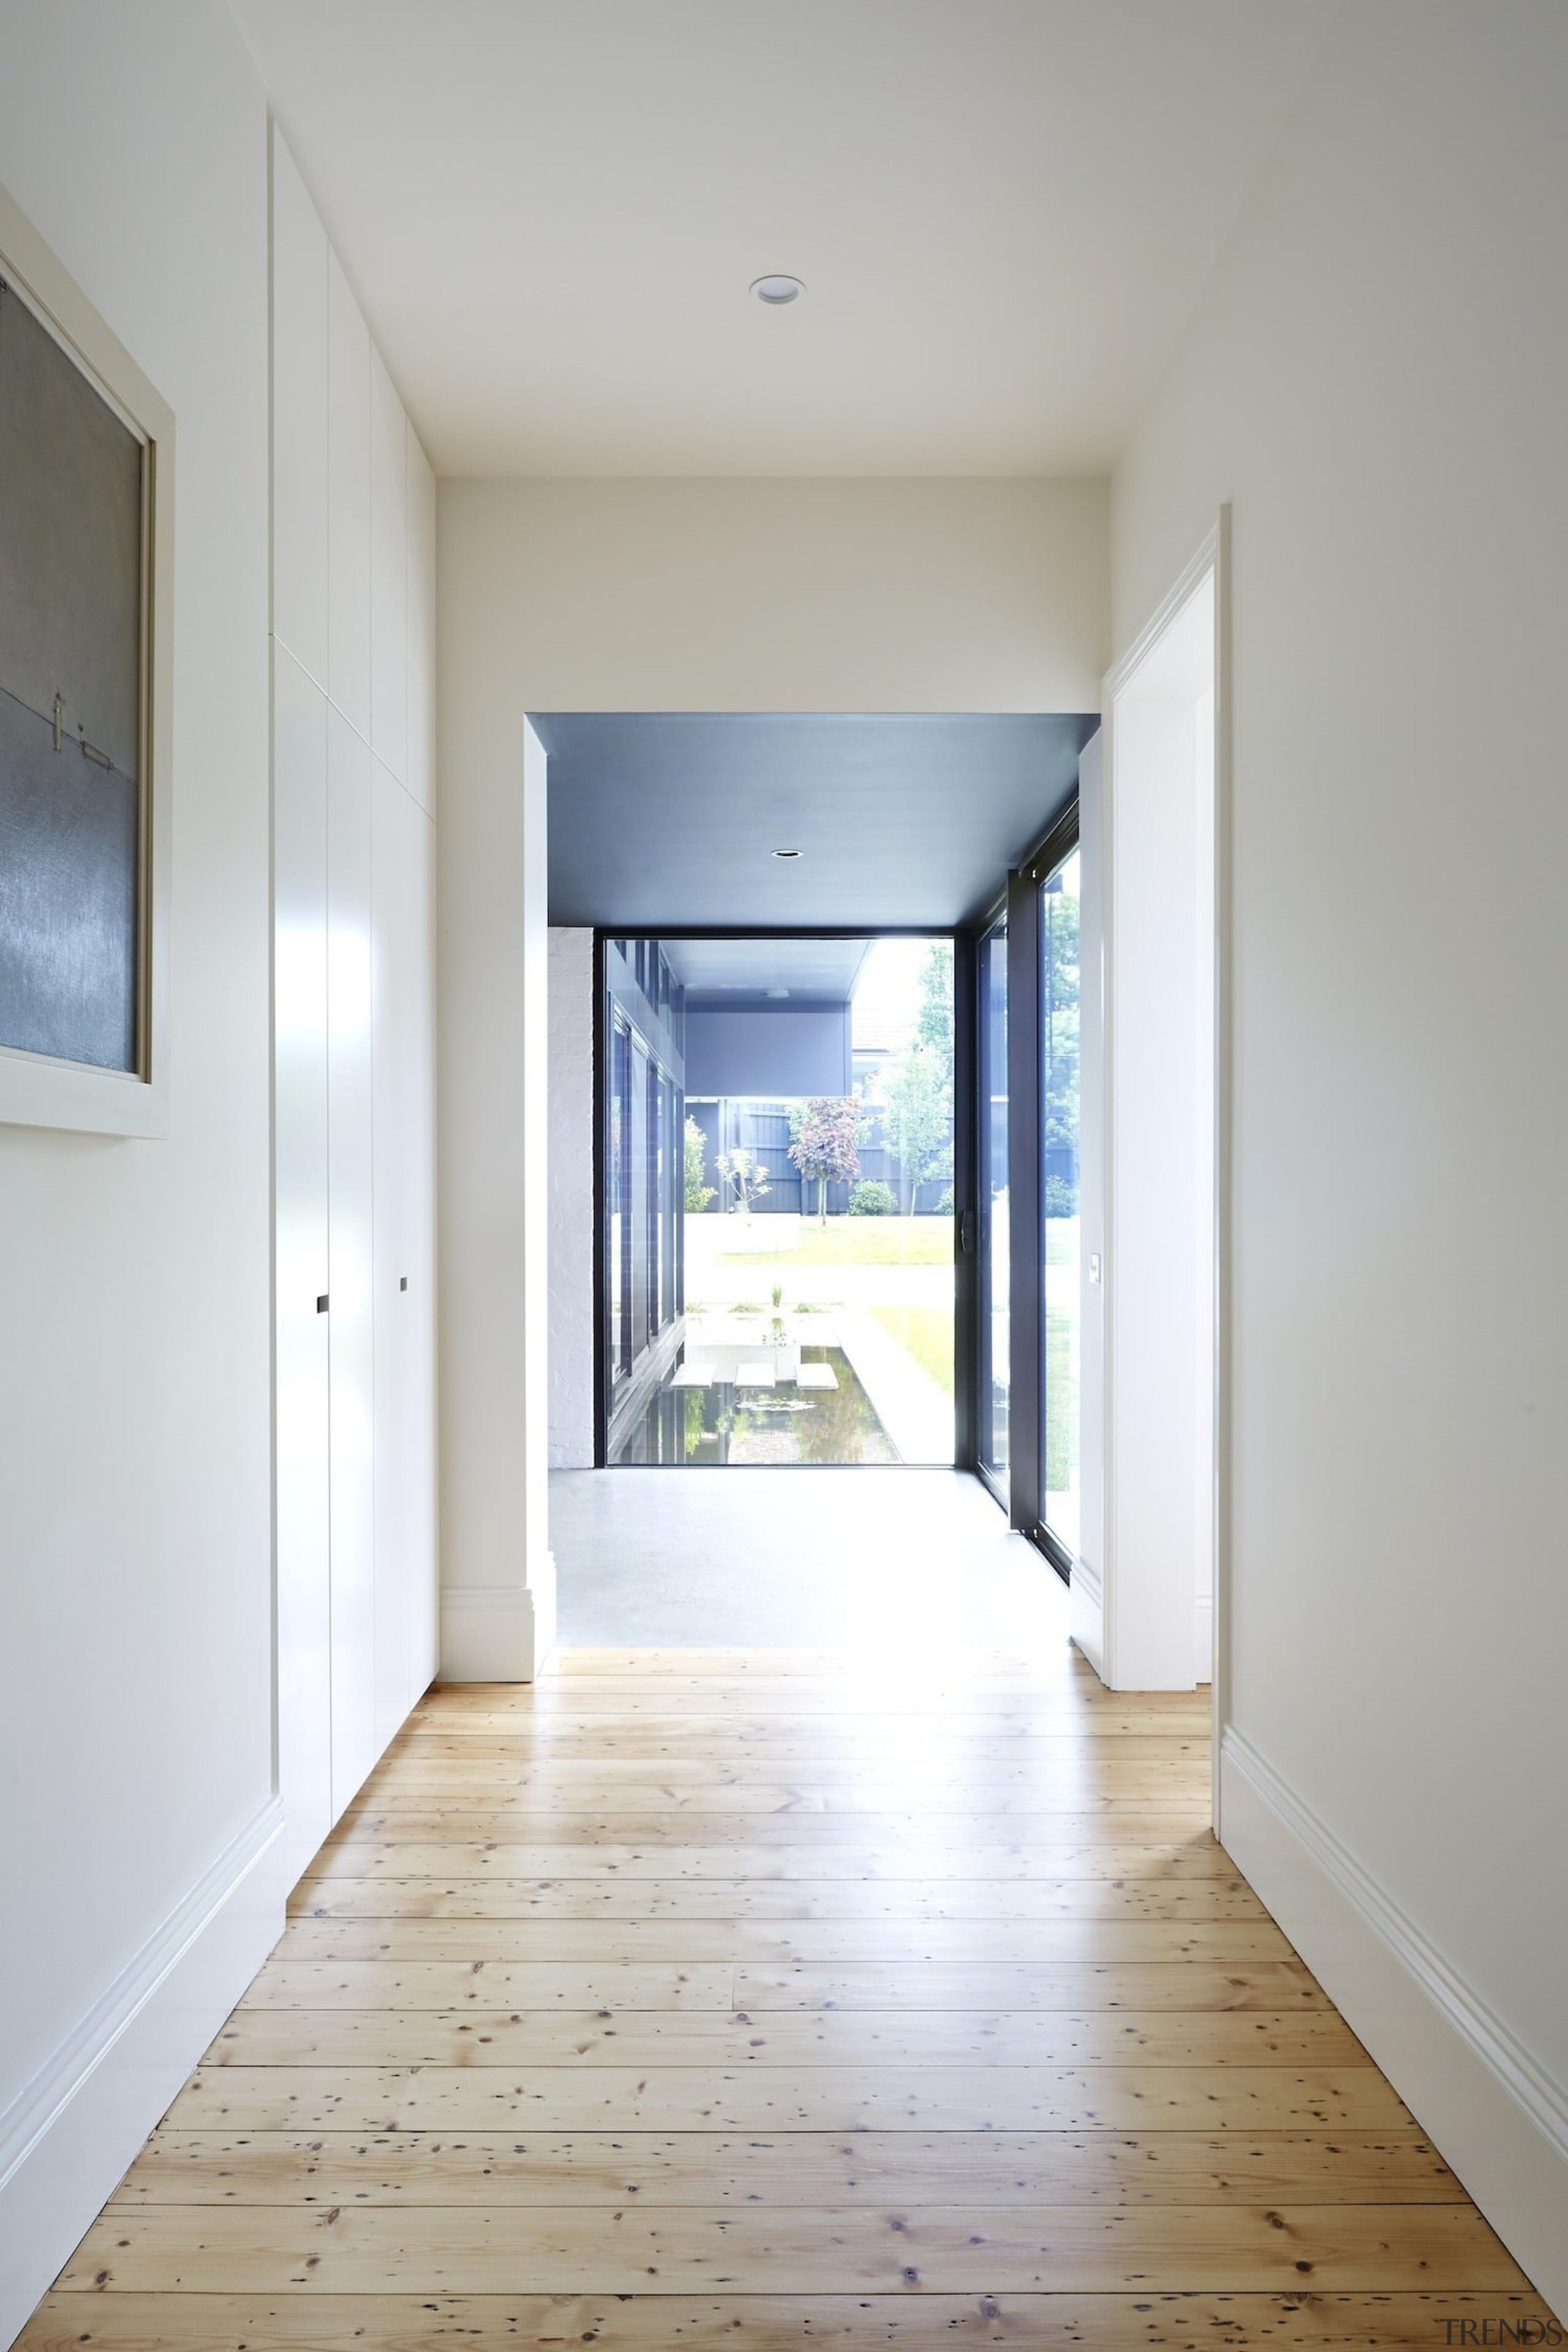 Architect: Nic Owen ArchitectsPhotography by Christine apartment, daylighting, door, estate, floor, flooring, hardwood, home, house, interior design, laminate flooring, property, real estate, room, window, wood, wood flooring, gray, white